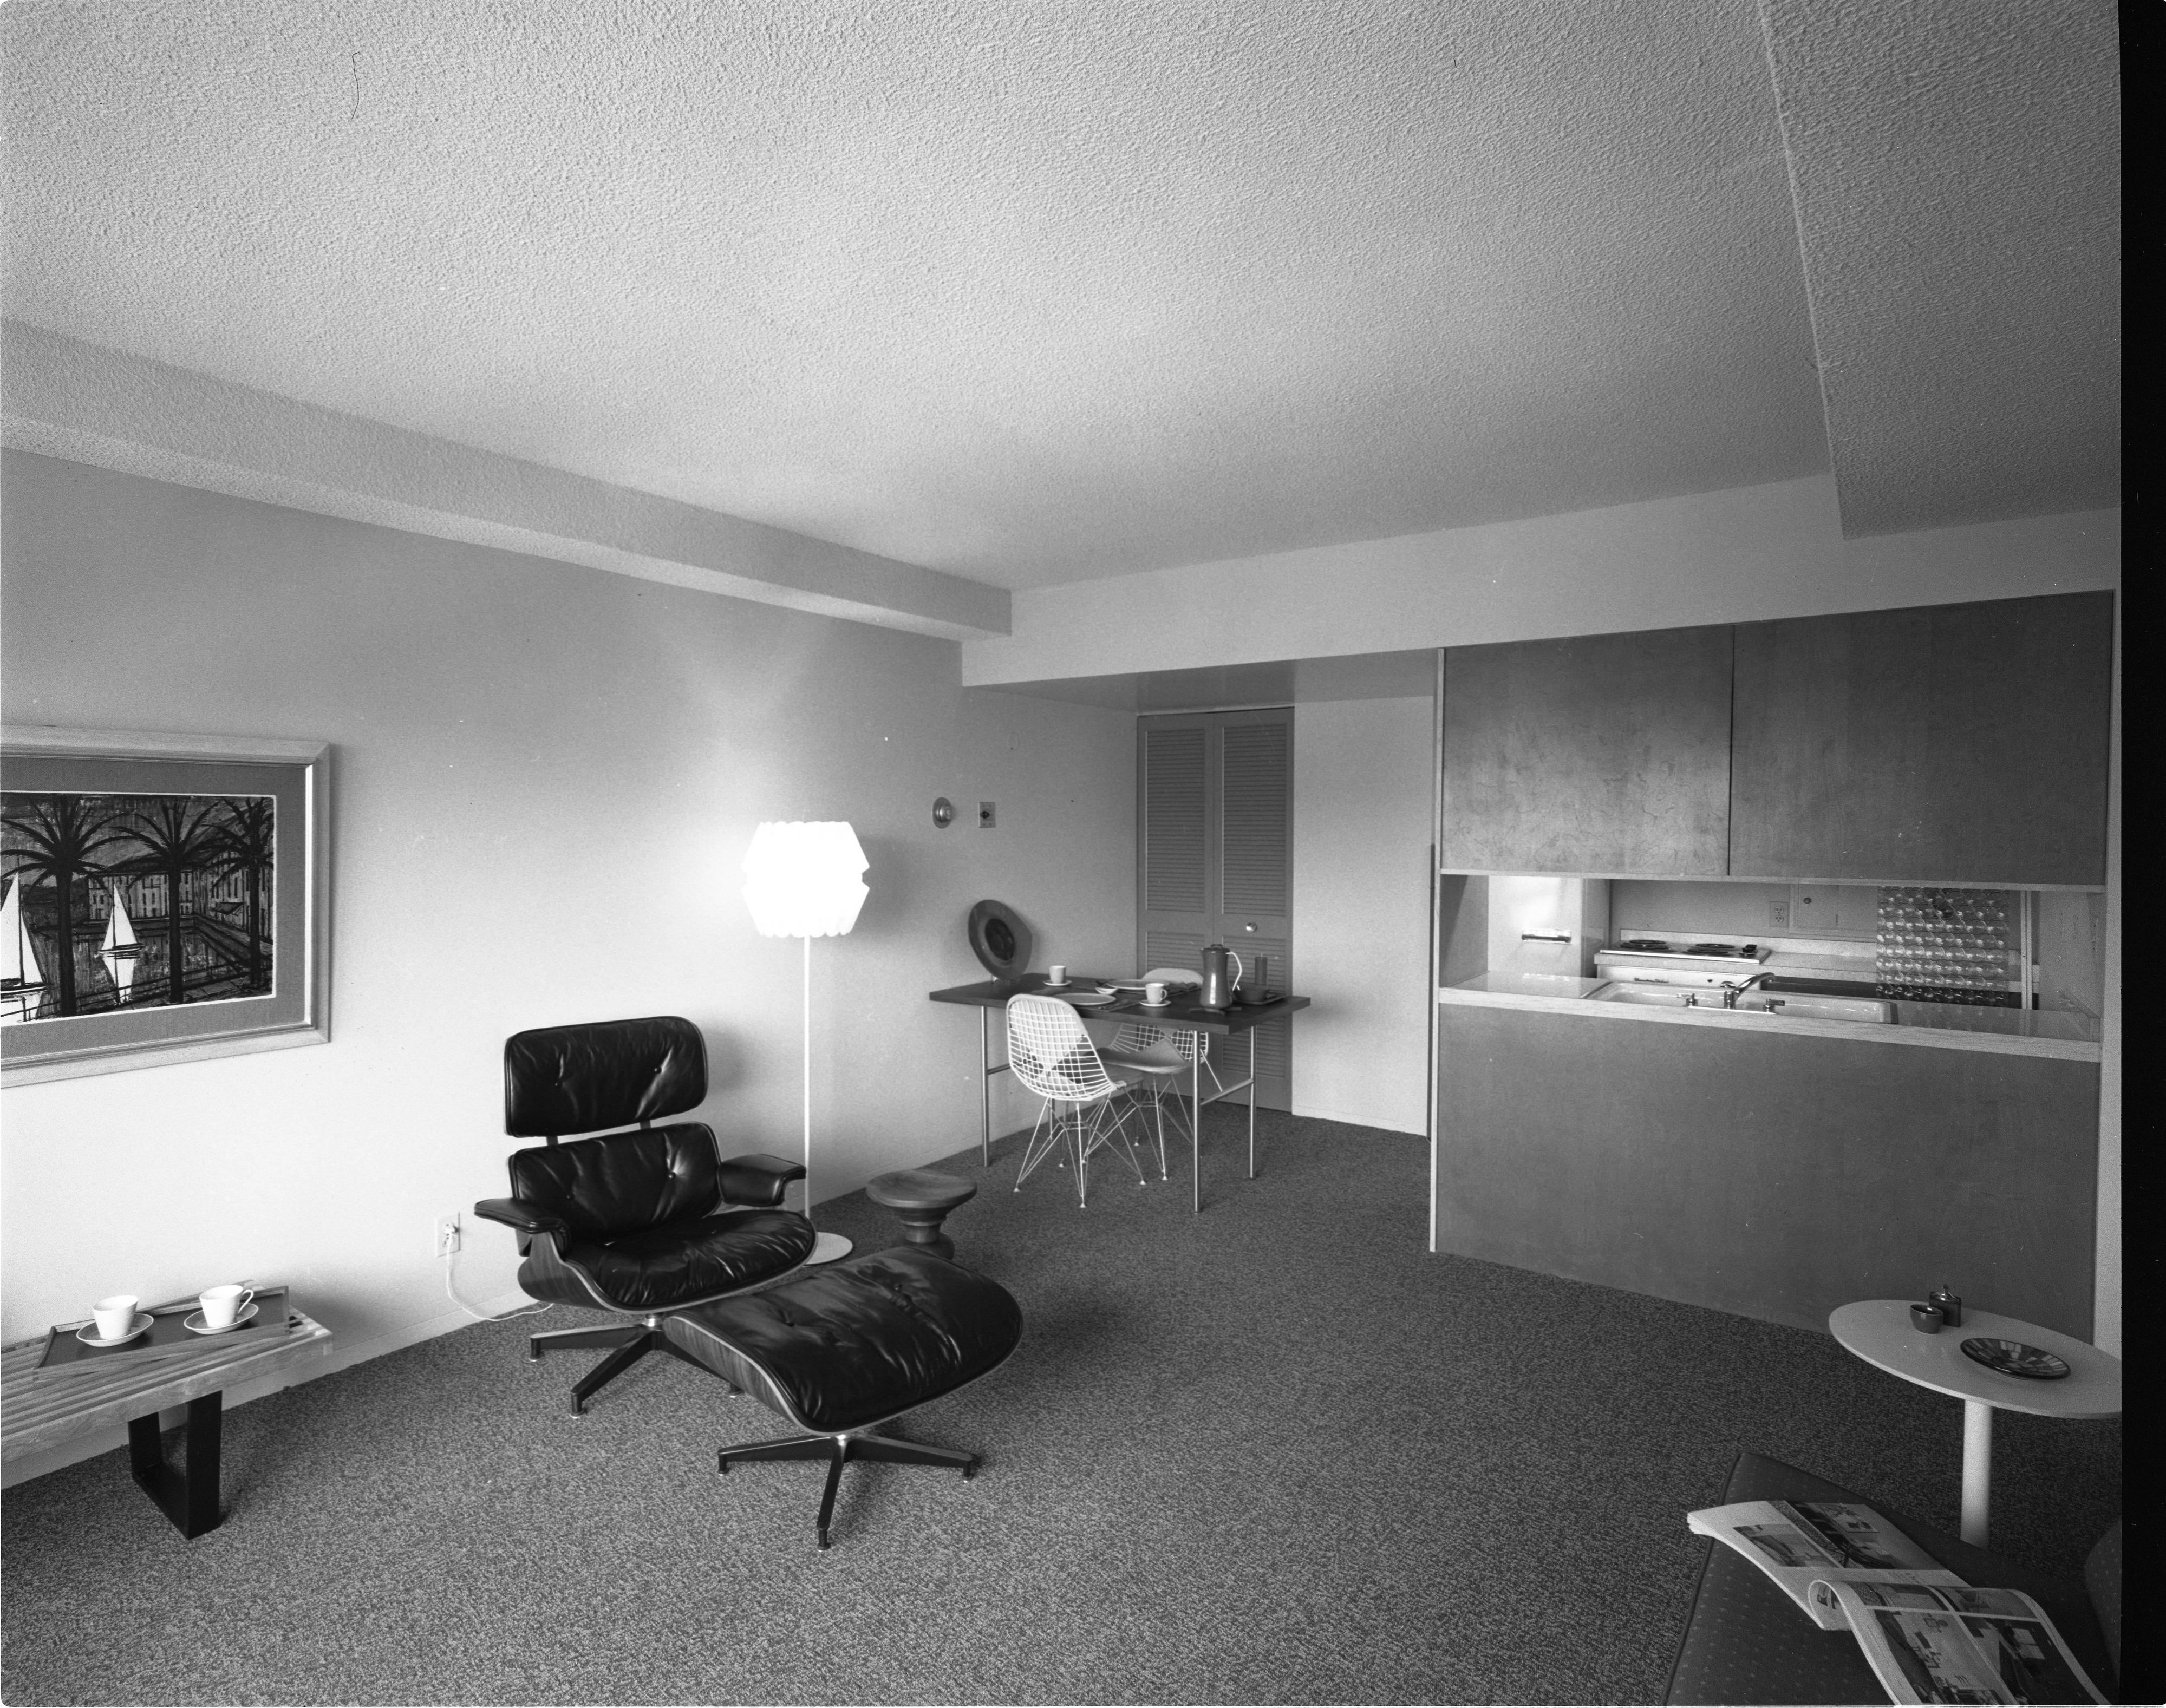 Maynard House Apartment, Herman Miller Model, Interior, May 25, 1962 ...